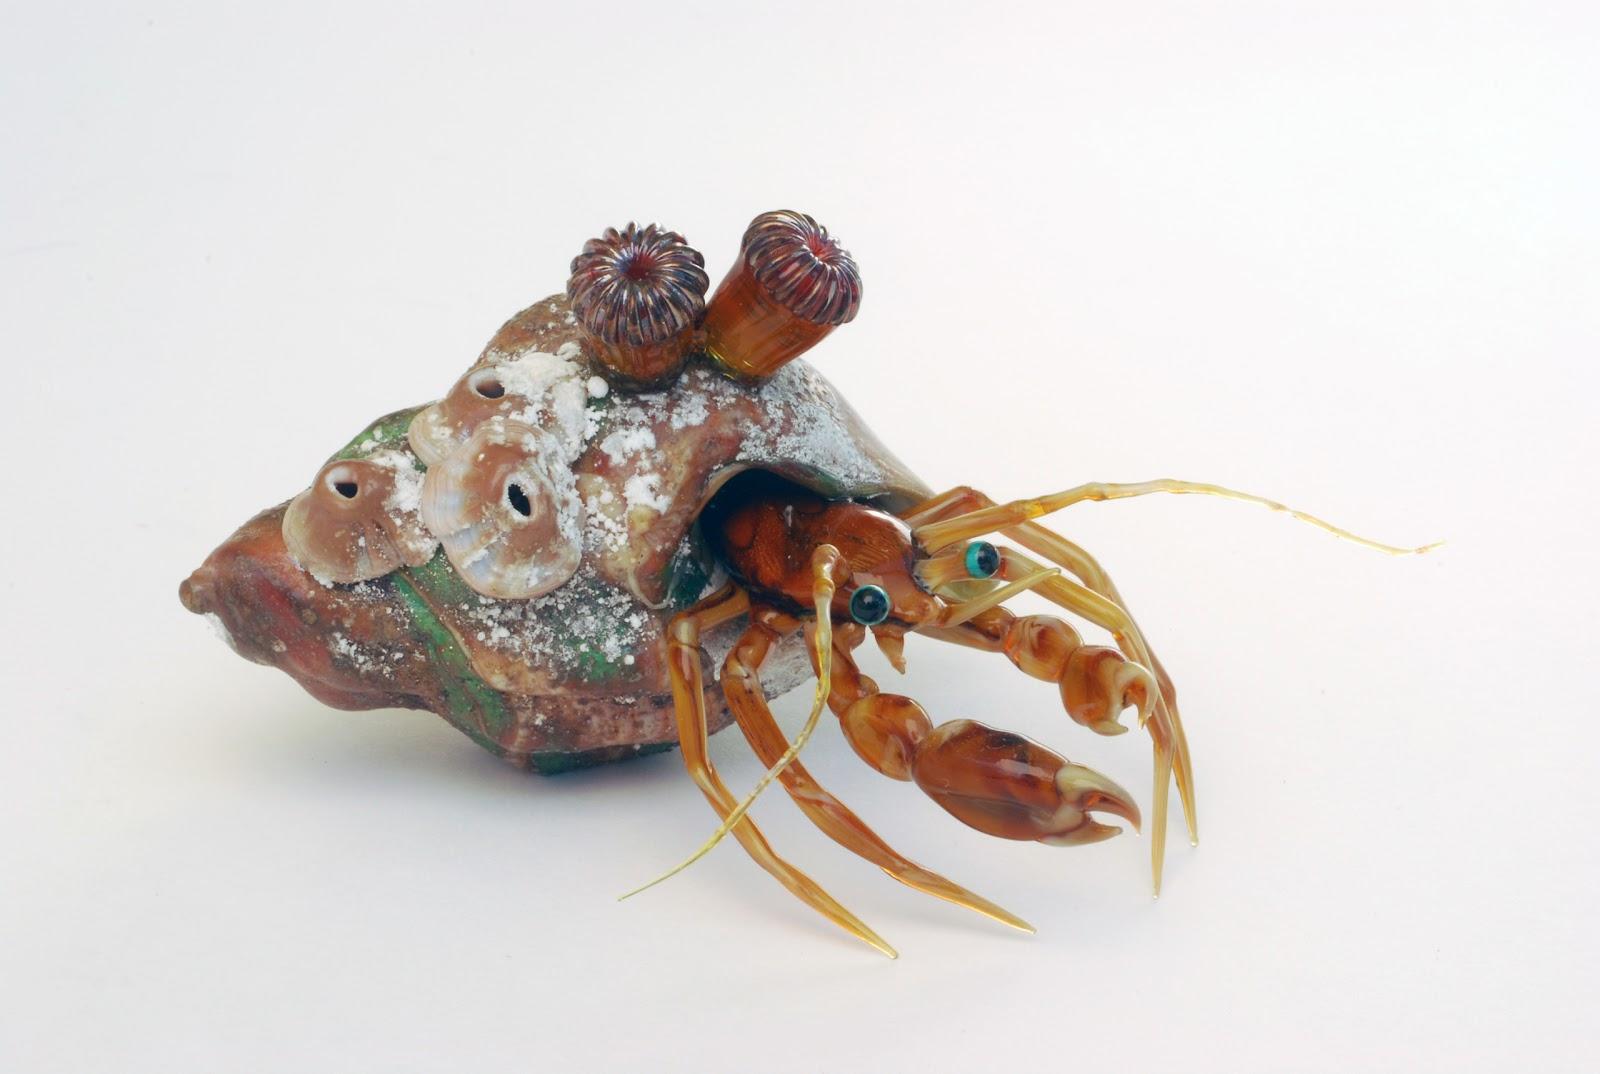 Hermit crab - photo#9